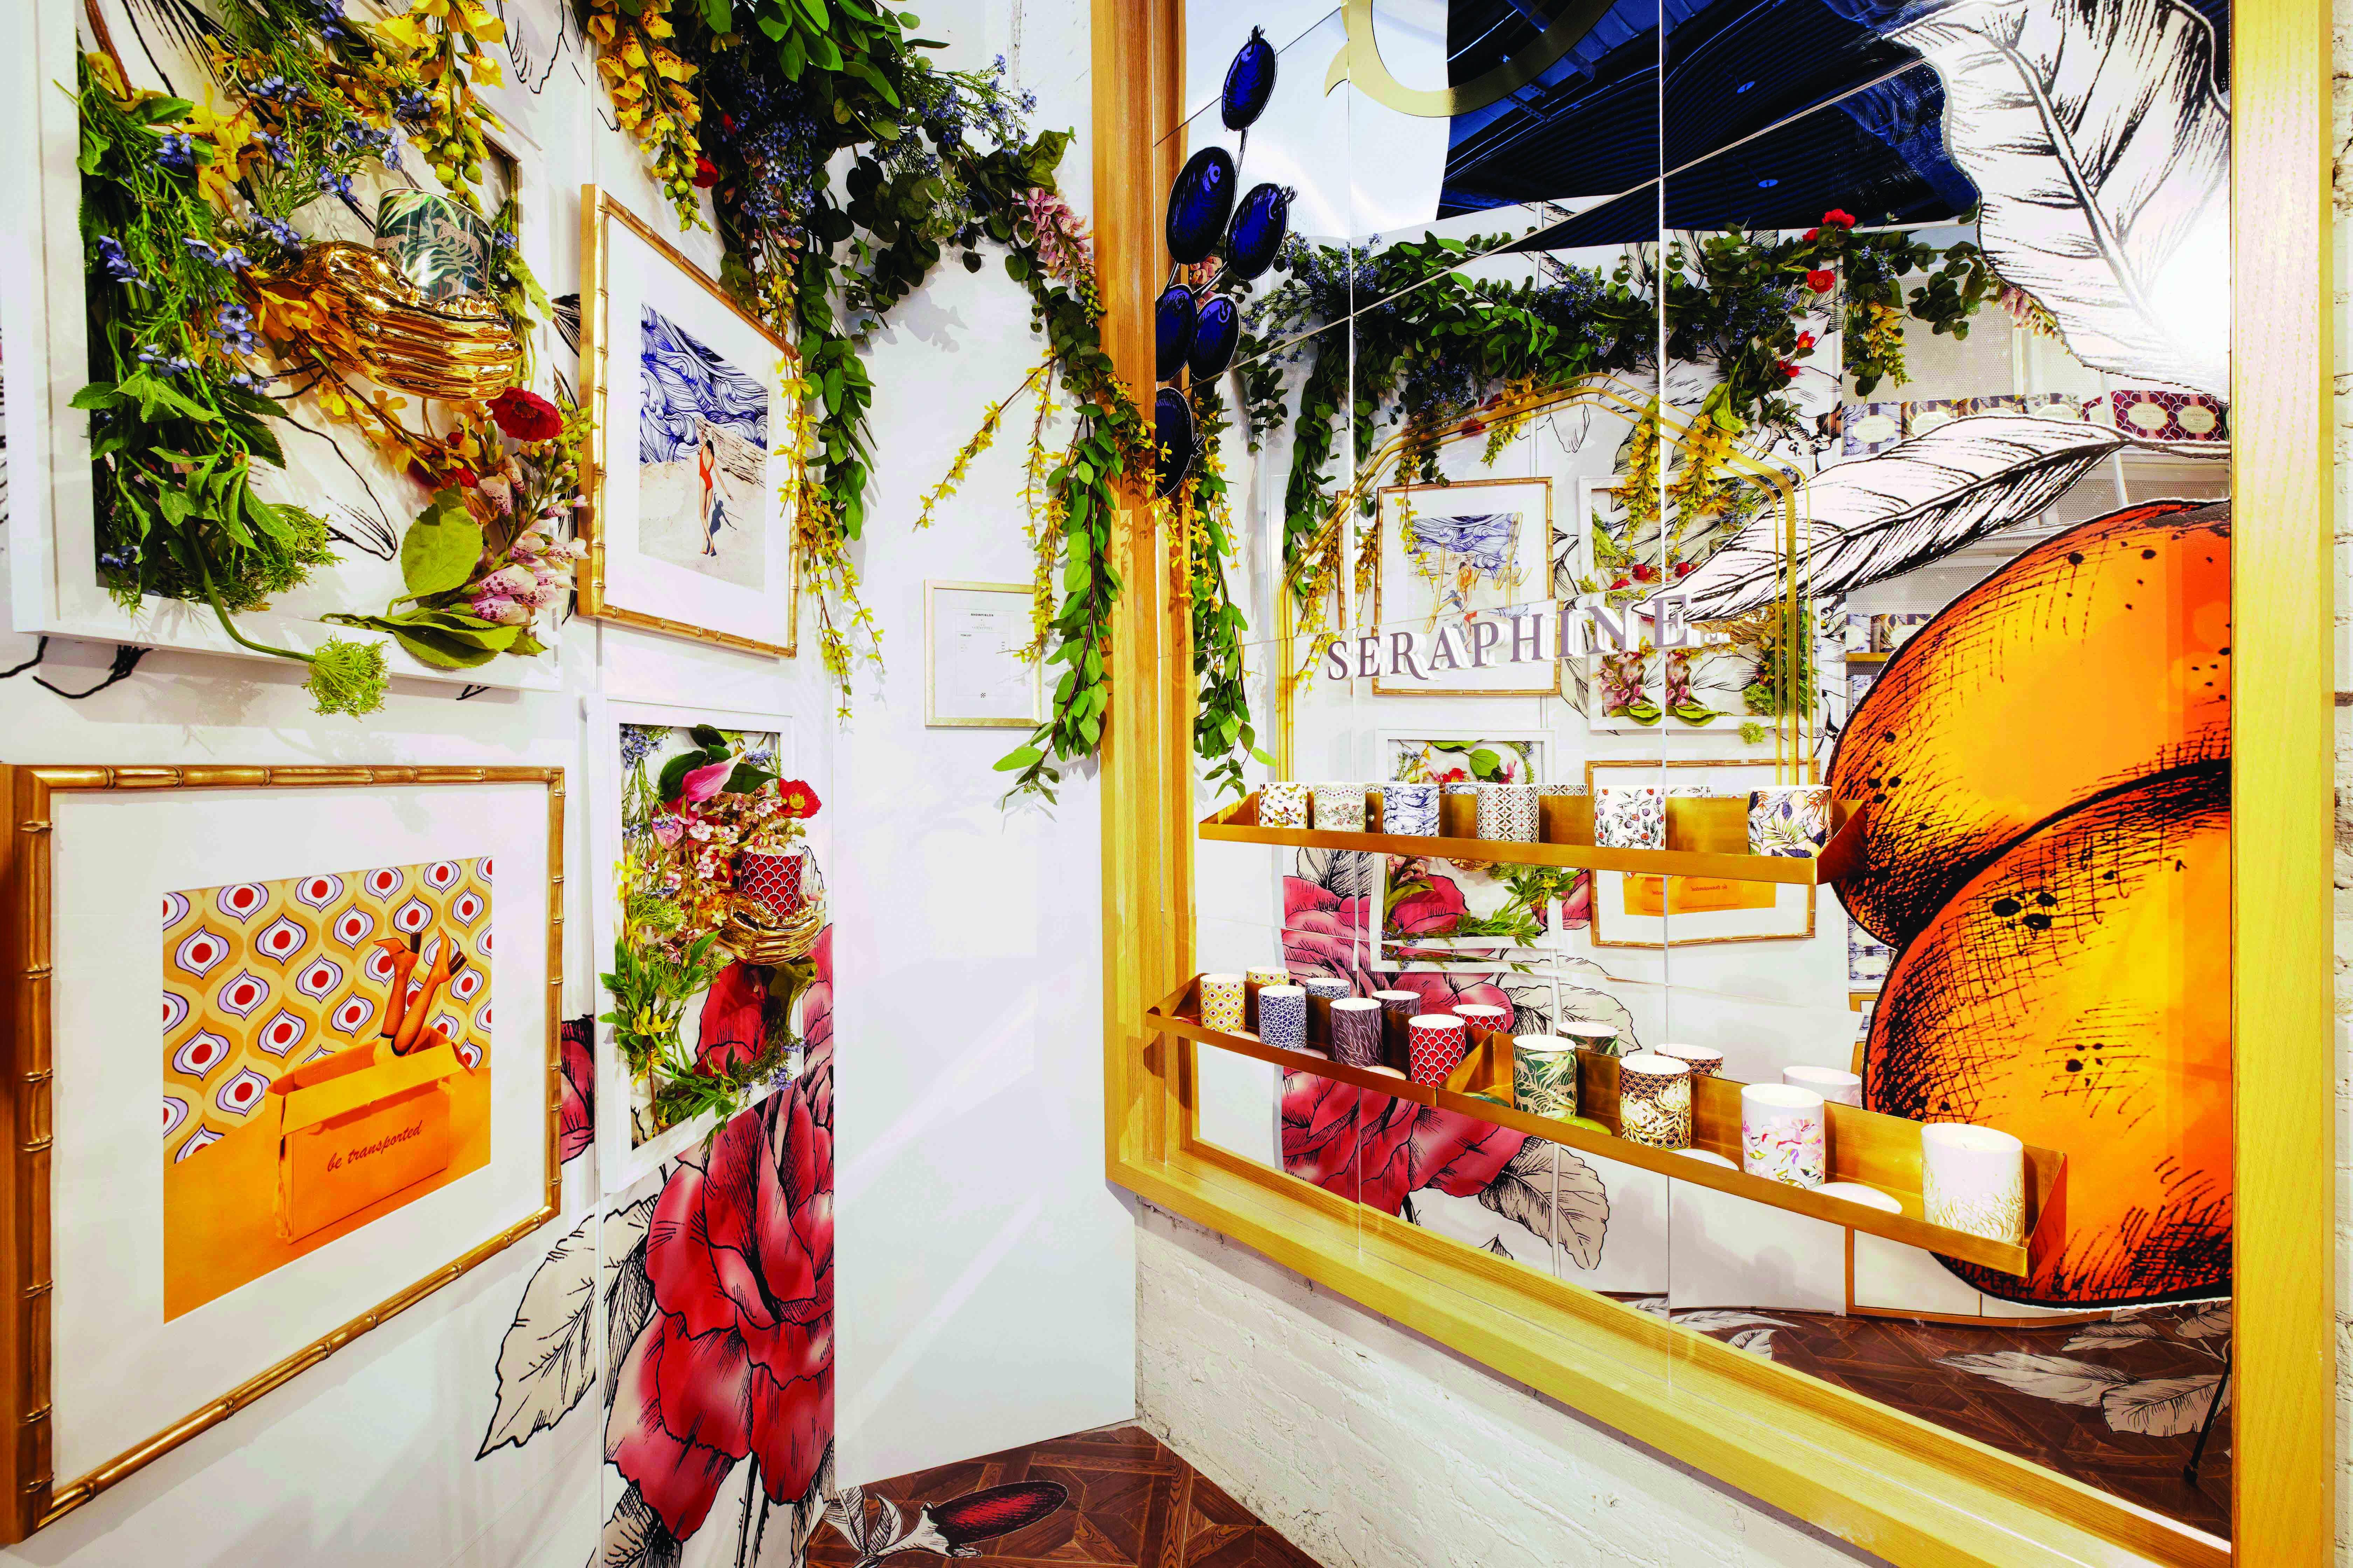 L'or de Seraphine showcase at Showfields